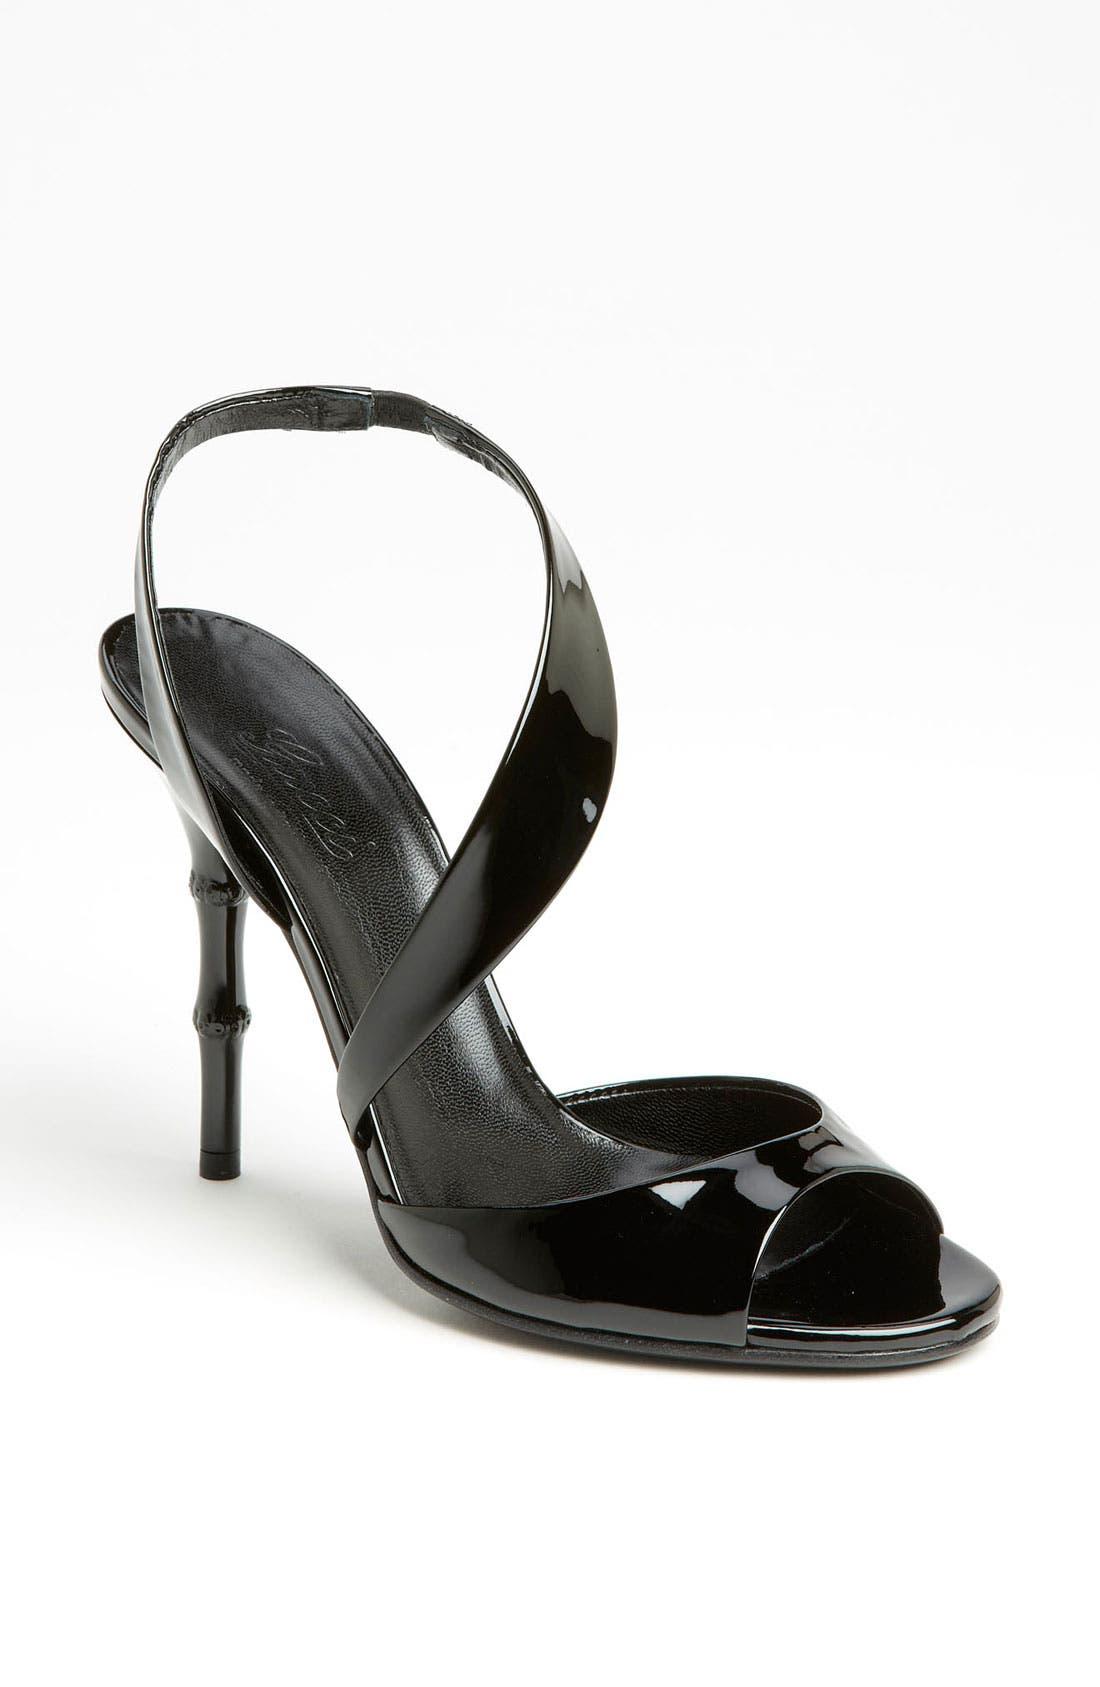 Main Image - Gucci 'Linda' Bamboo Heel Sandal